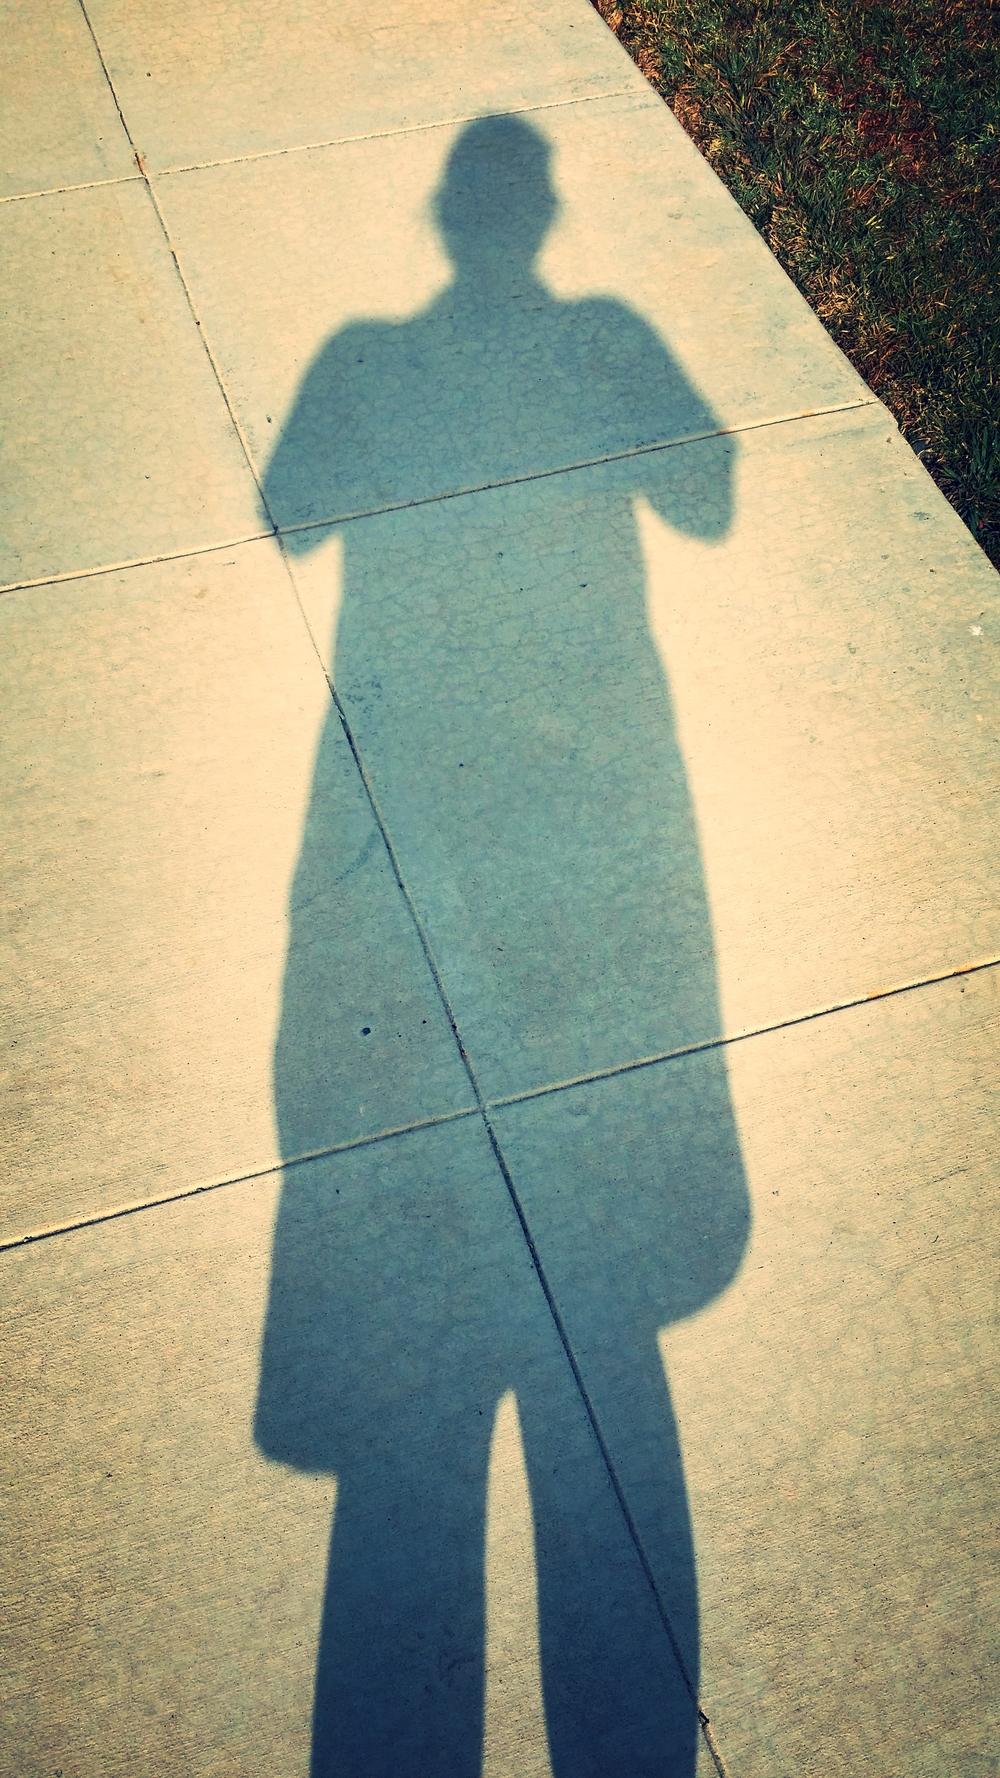 efr_silhouette.jpg